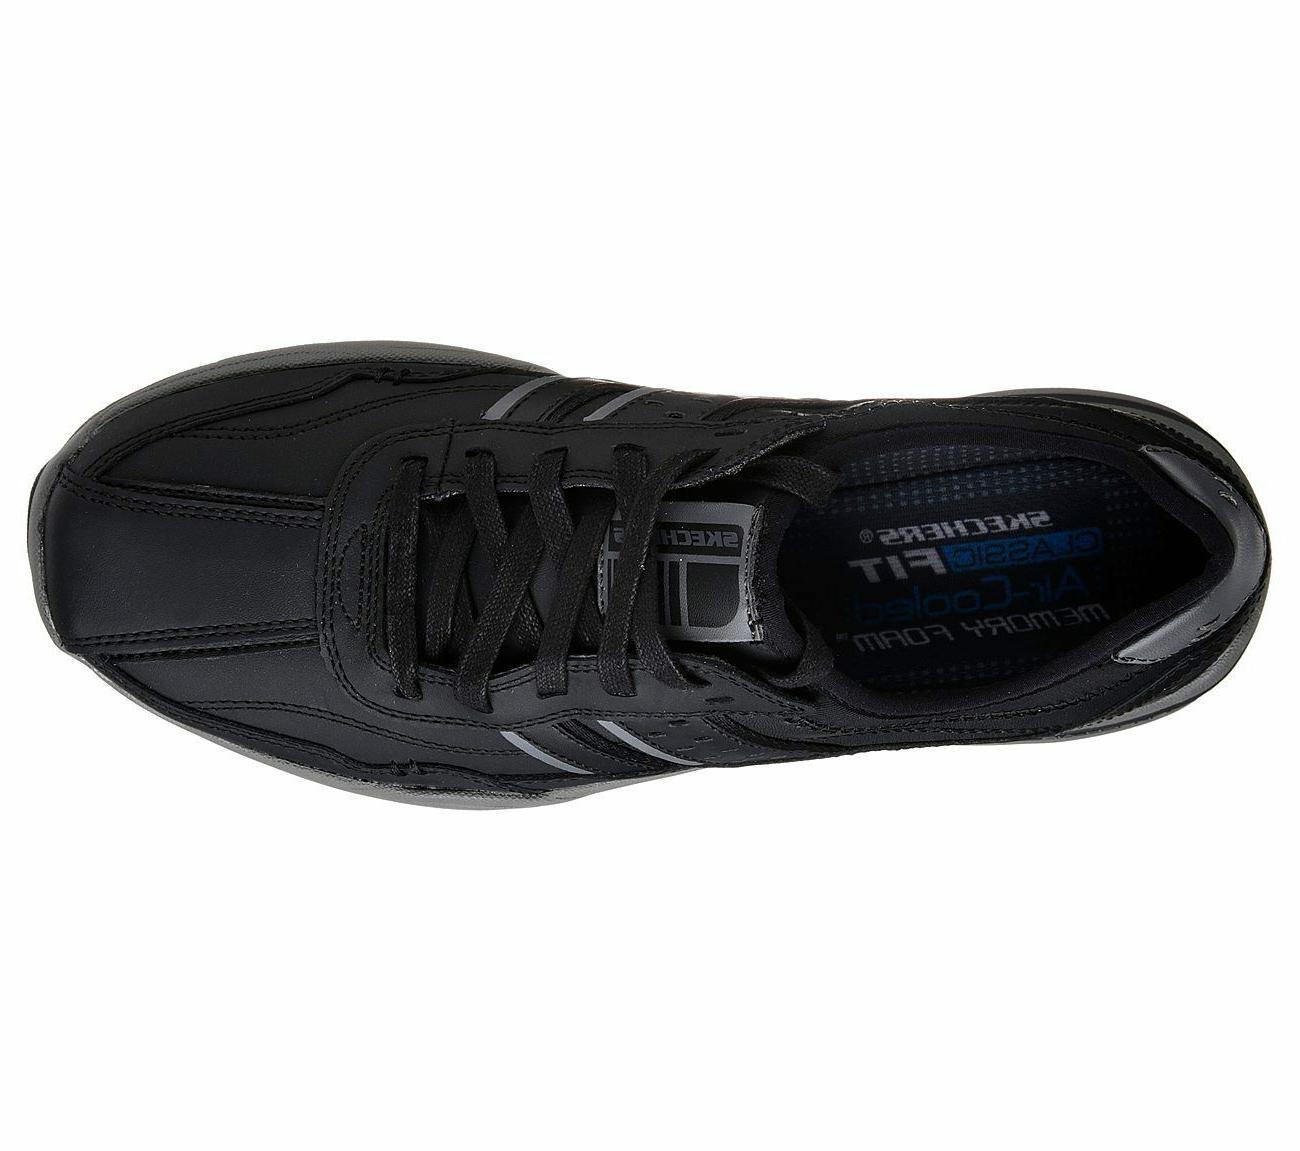 65055 Skechers shoes Men Foam Up Comfort Leather Oxford